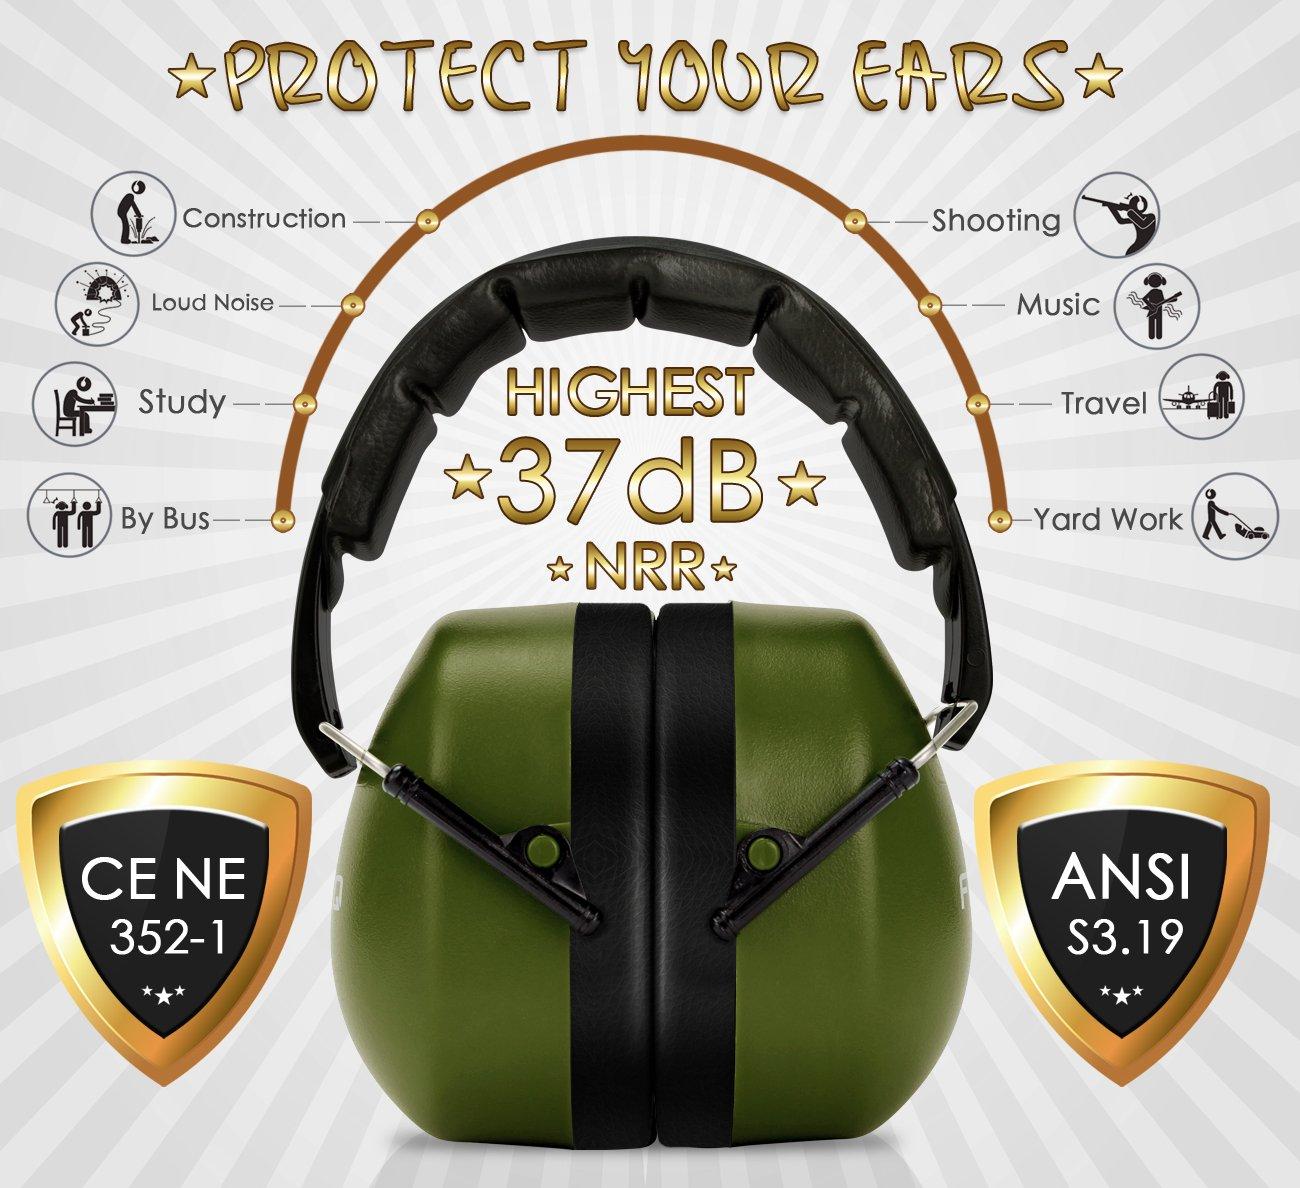 FRiEQ 37 dB NRR Sound Technology Safety Ear Muffs with LRPu Foam for Shooting, Music & Yard Work, Green by FRiEQ (Image #3)